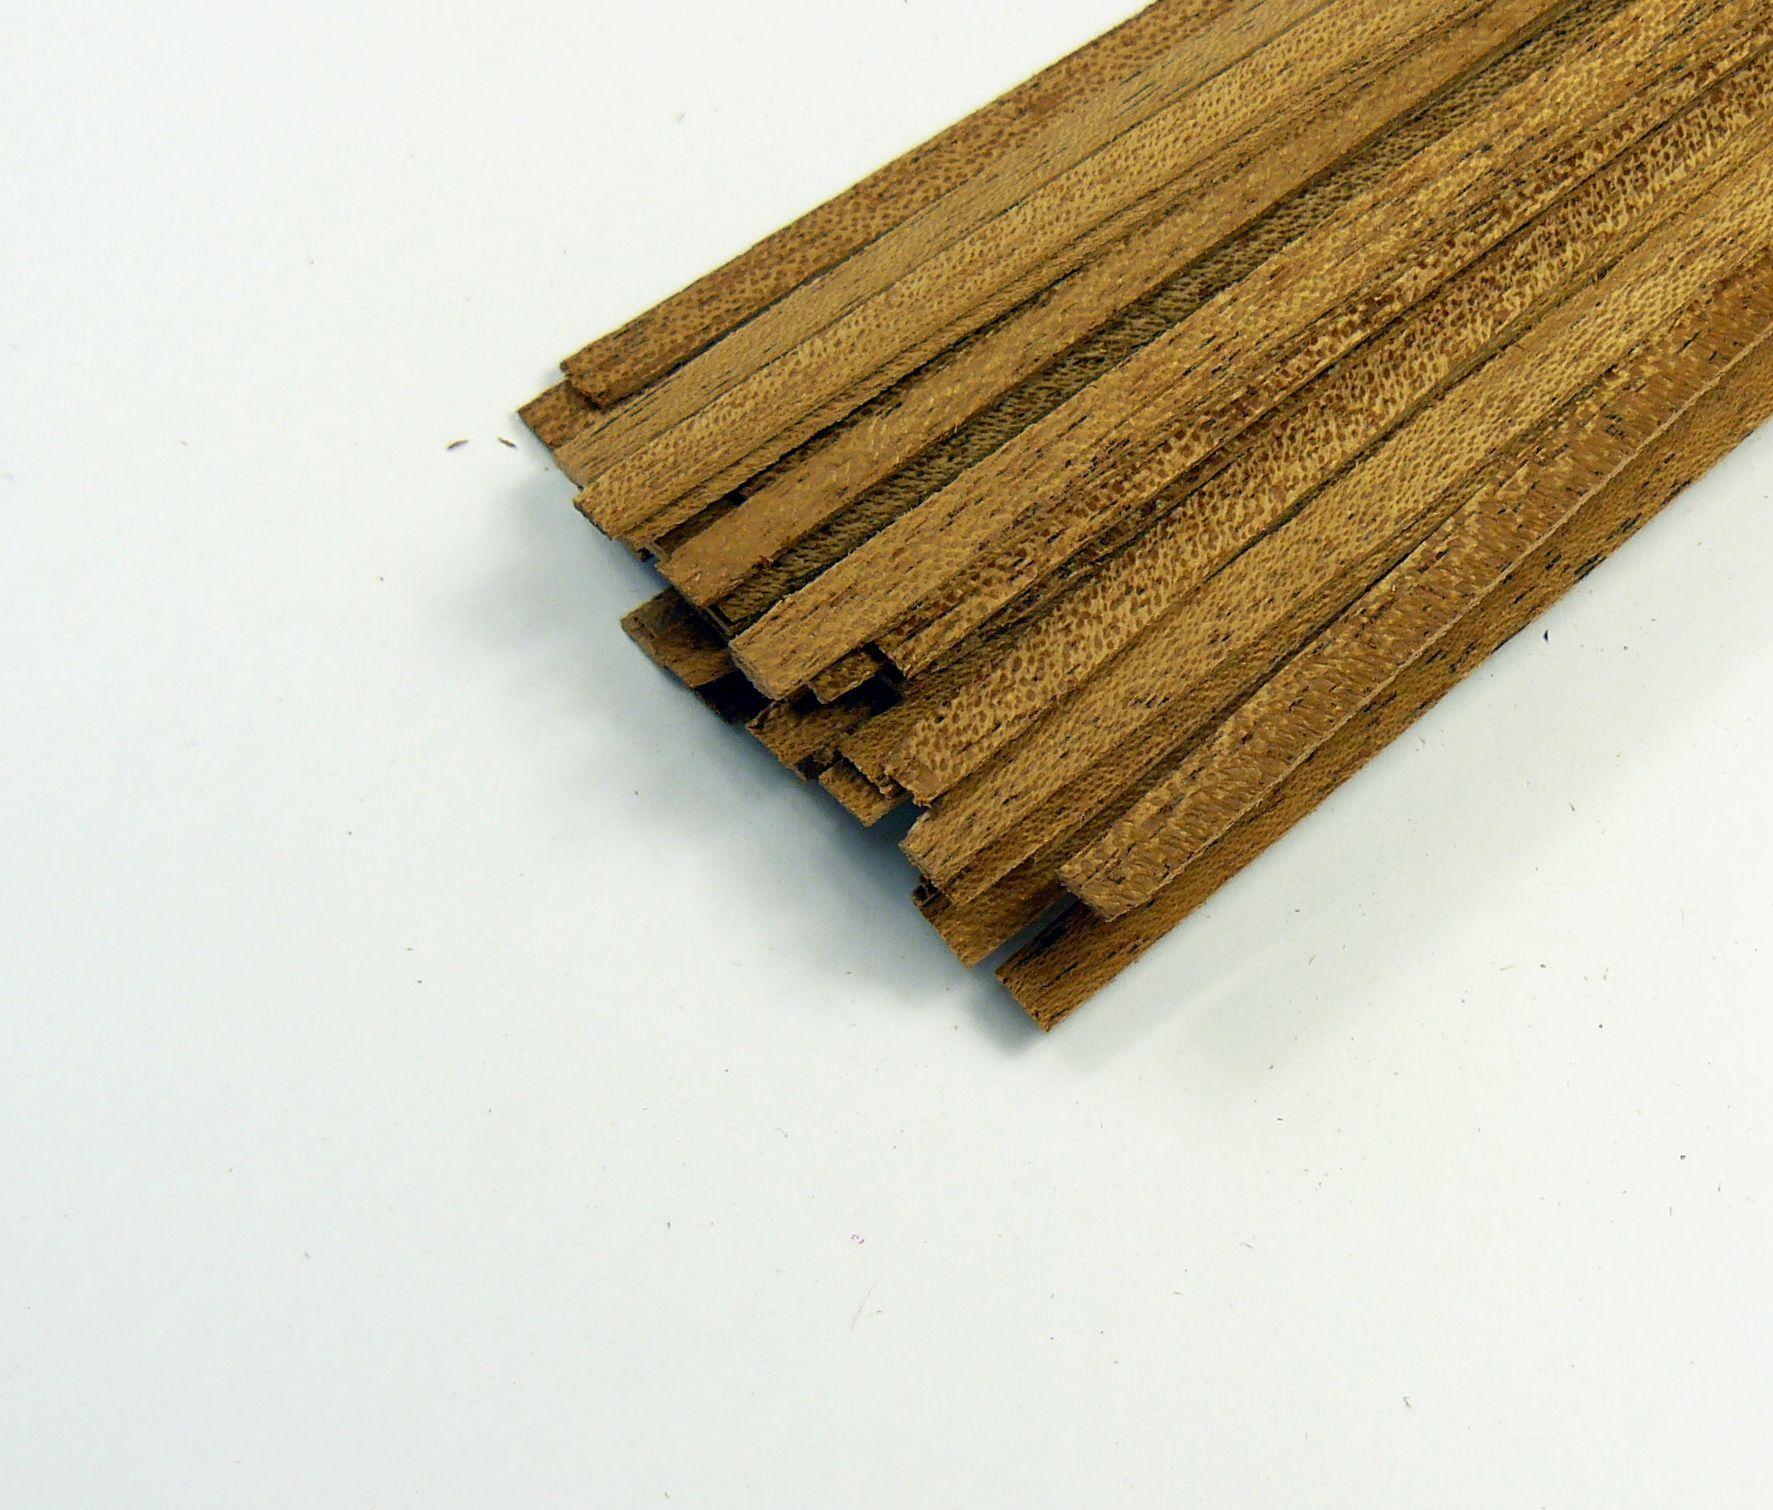 1000mm Mahogany Planking Bundles of 5